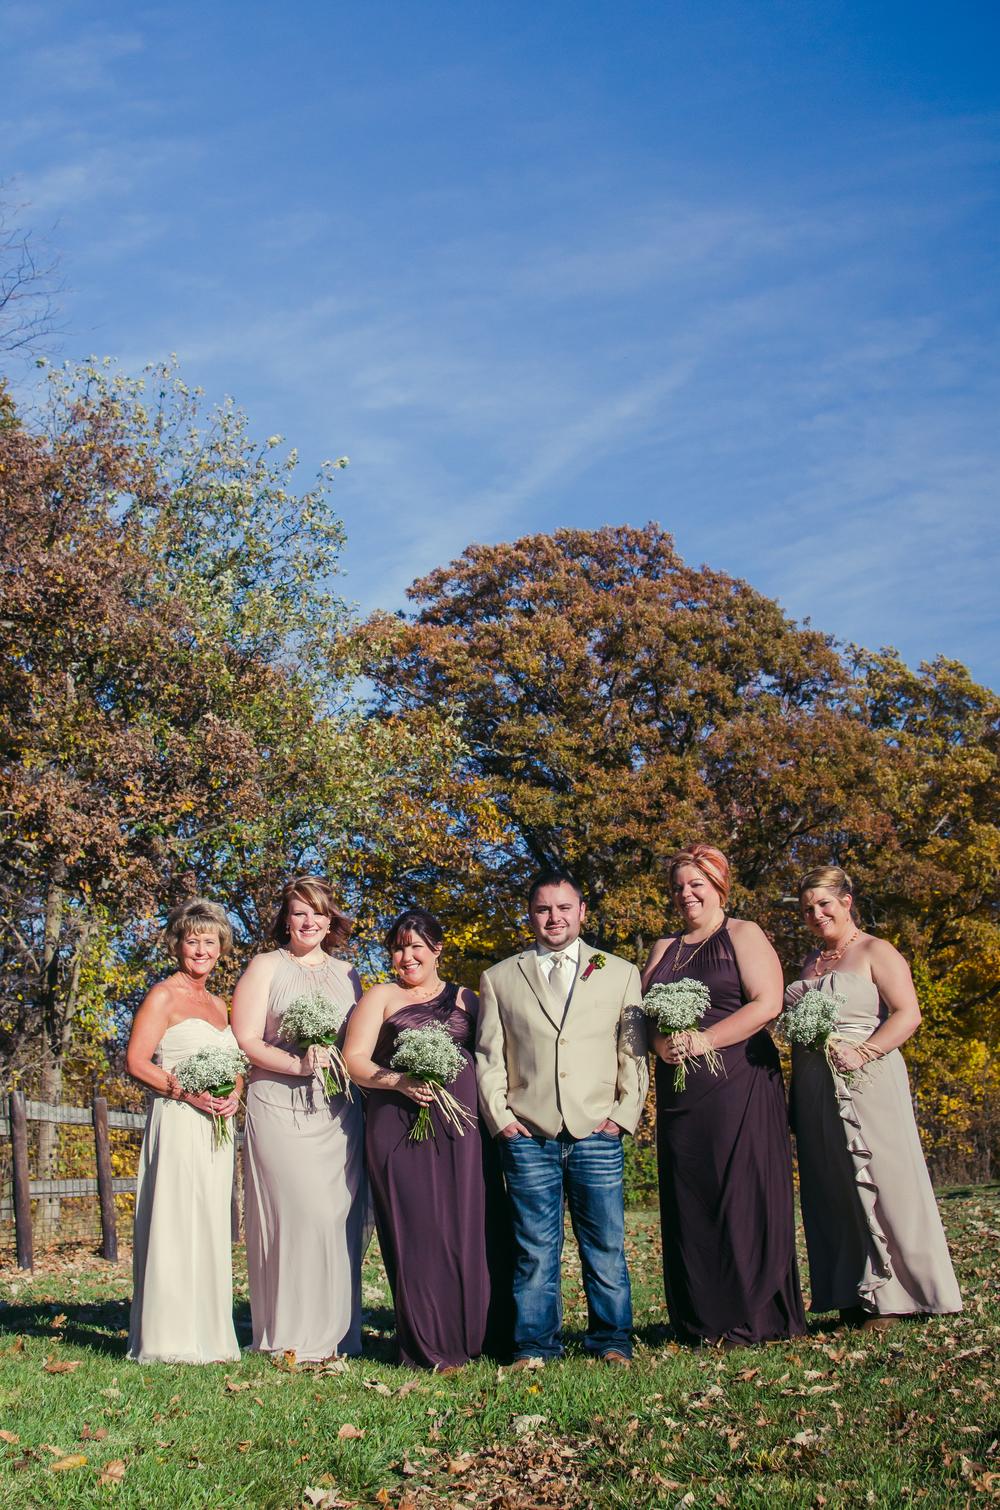 By Kara Photo-Wedding-Wedding Photography-Engagement Photography-Central Illinois-Central Illinois Wedding and Portrait Photographer-Watseka Illinois Photographer-Iroquois County Wedding Photographer-Iroquois County Fairgrounds